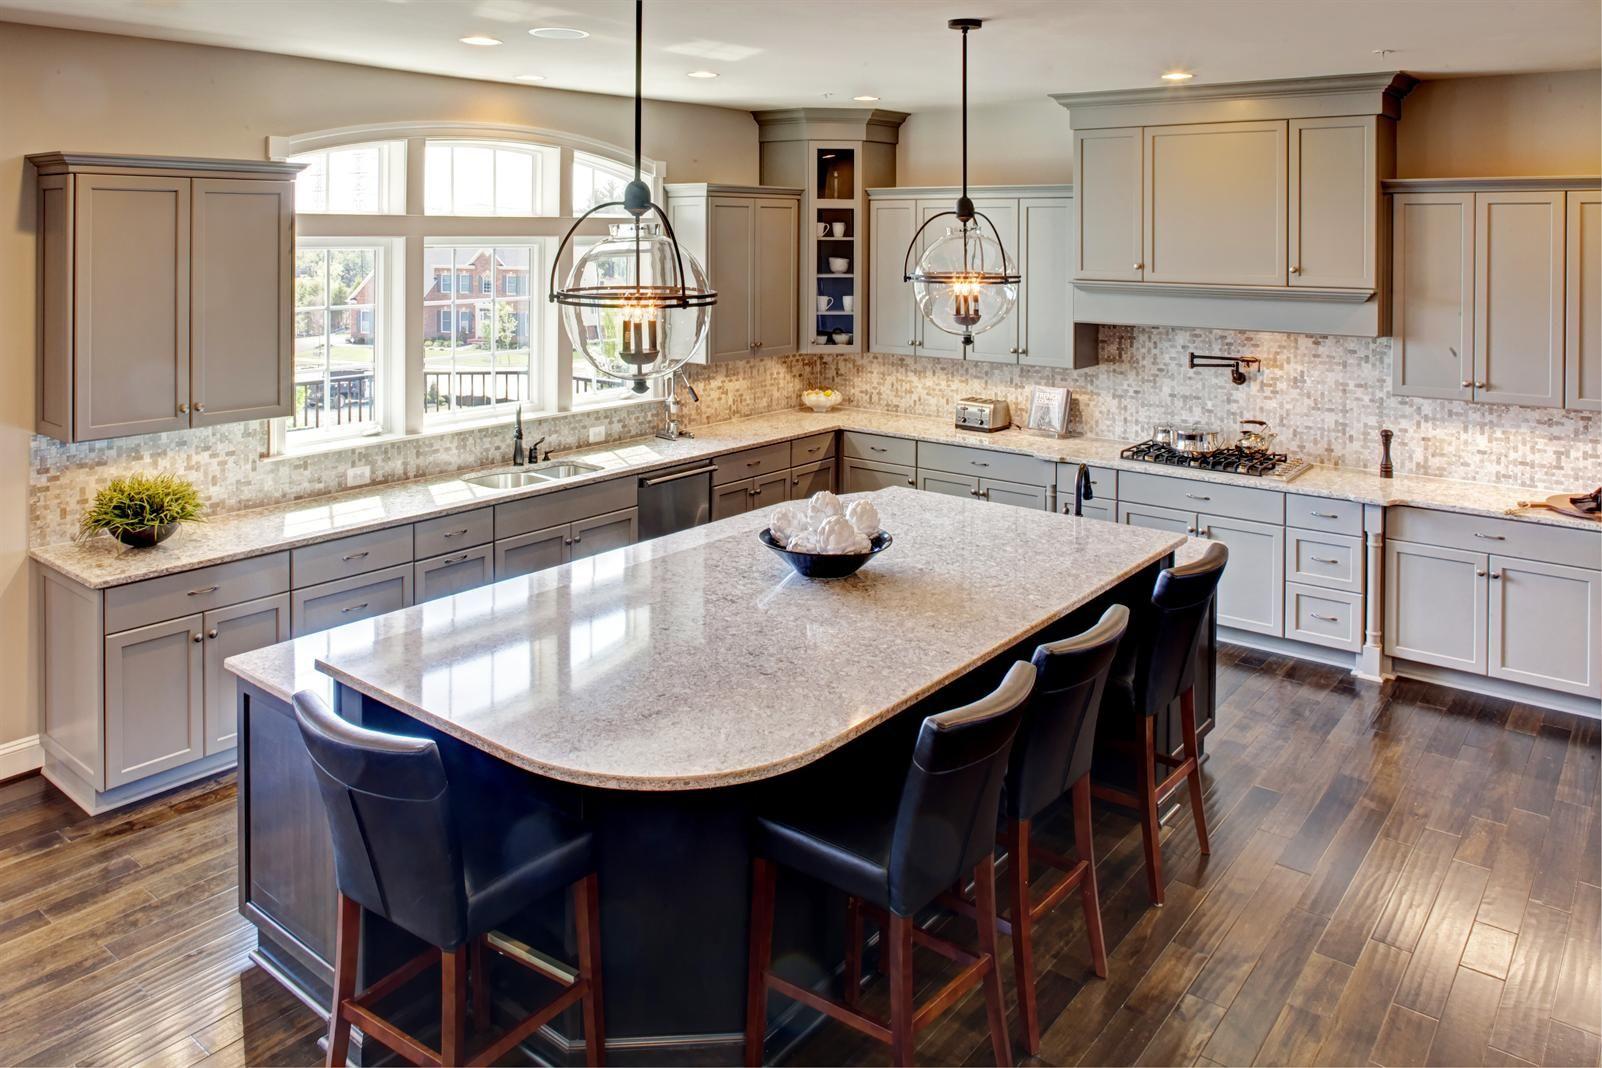 Gray cabinets New Monticello II Home Model For Sale ...